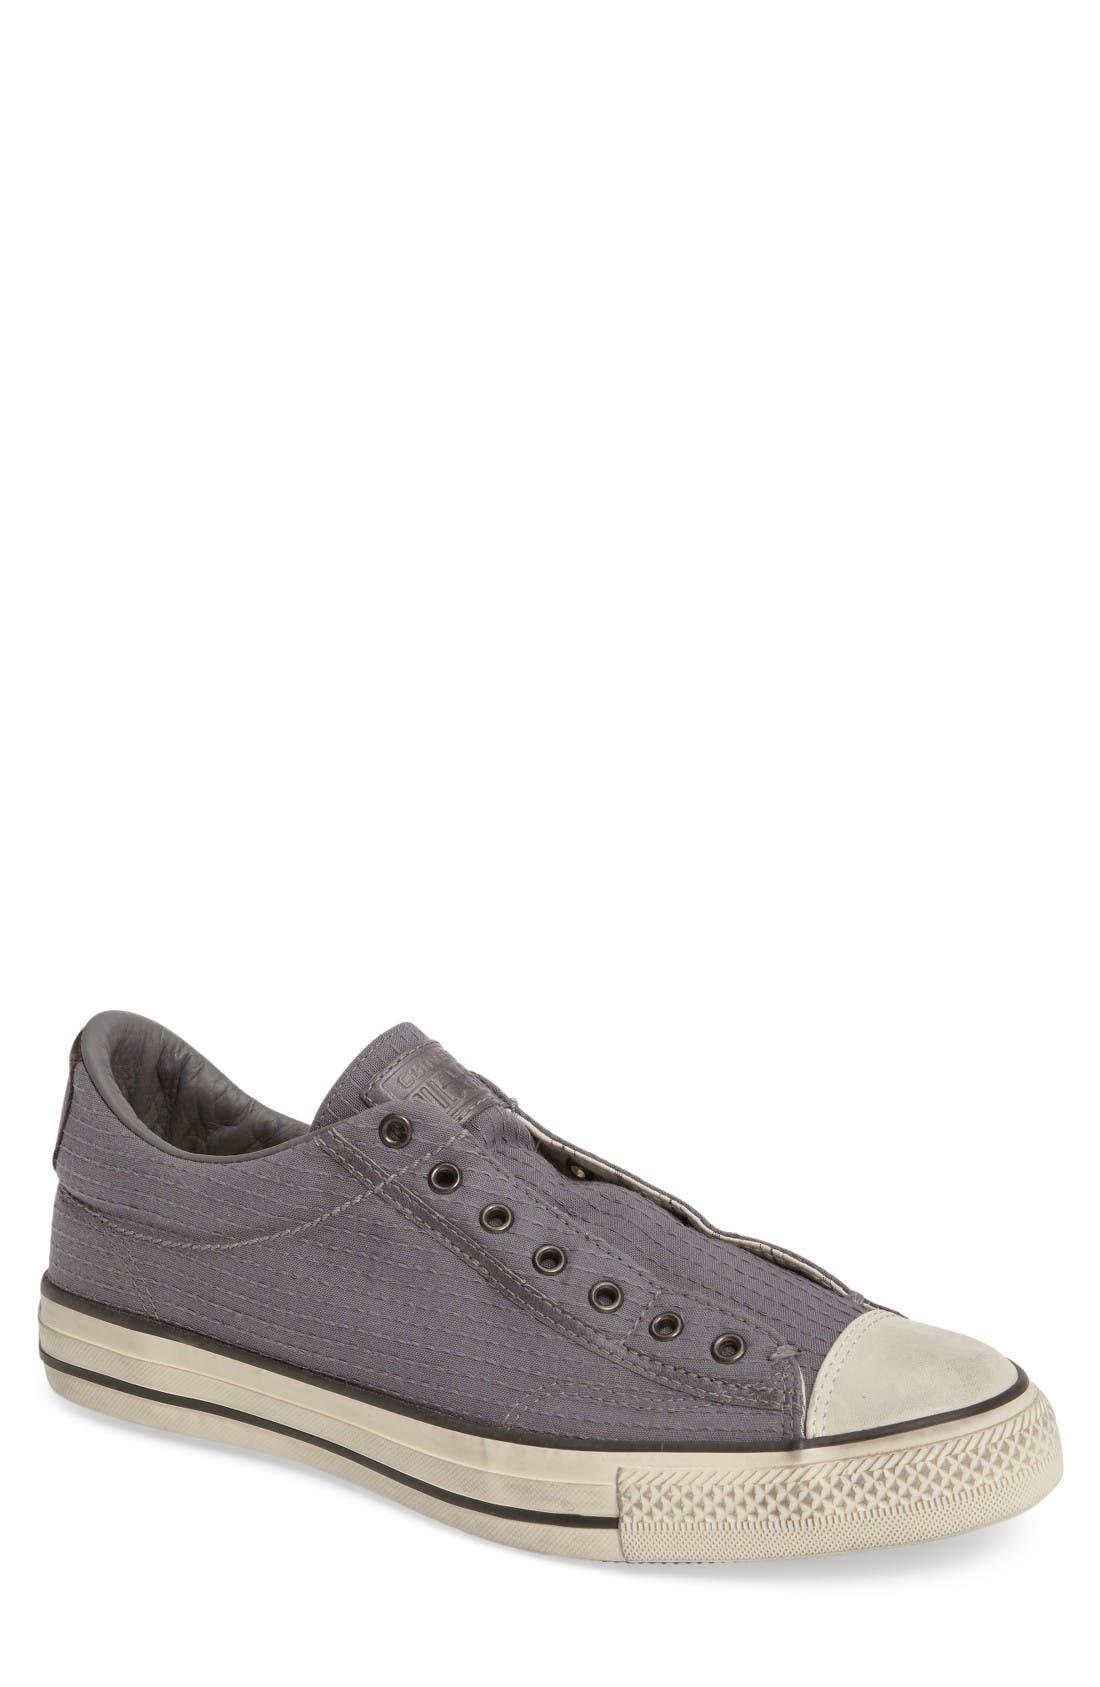 Alternate Image 1 Selected - Converse by John Varvatos Chuck Taylor® All Star® Slip-On Sneaker (Men)